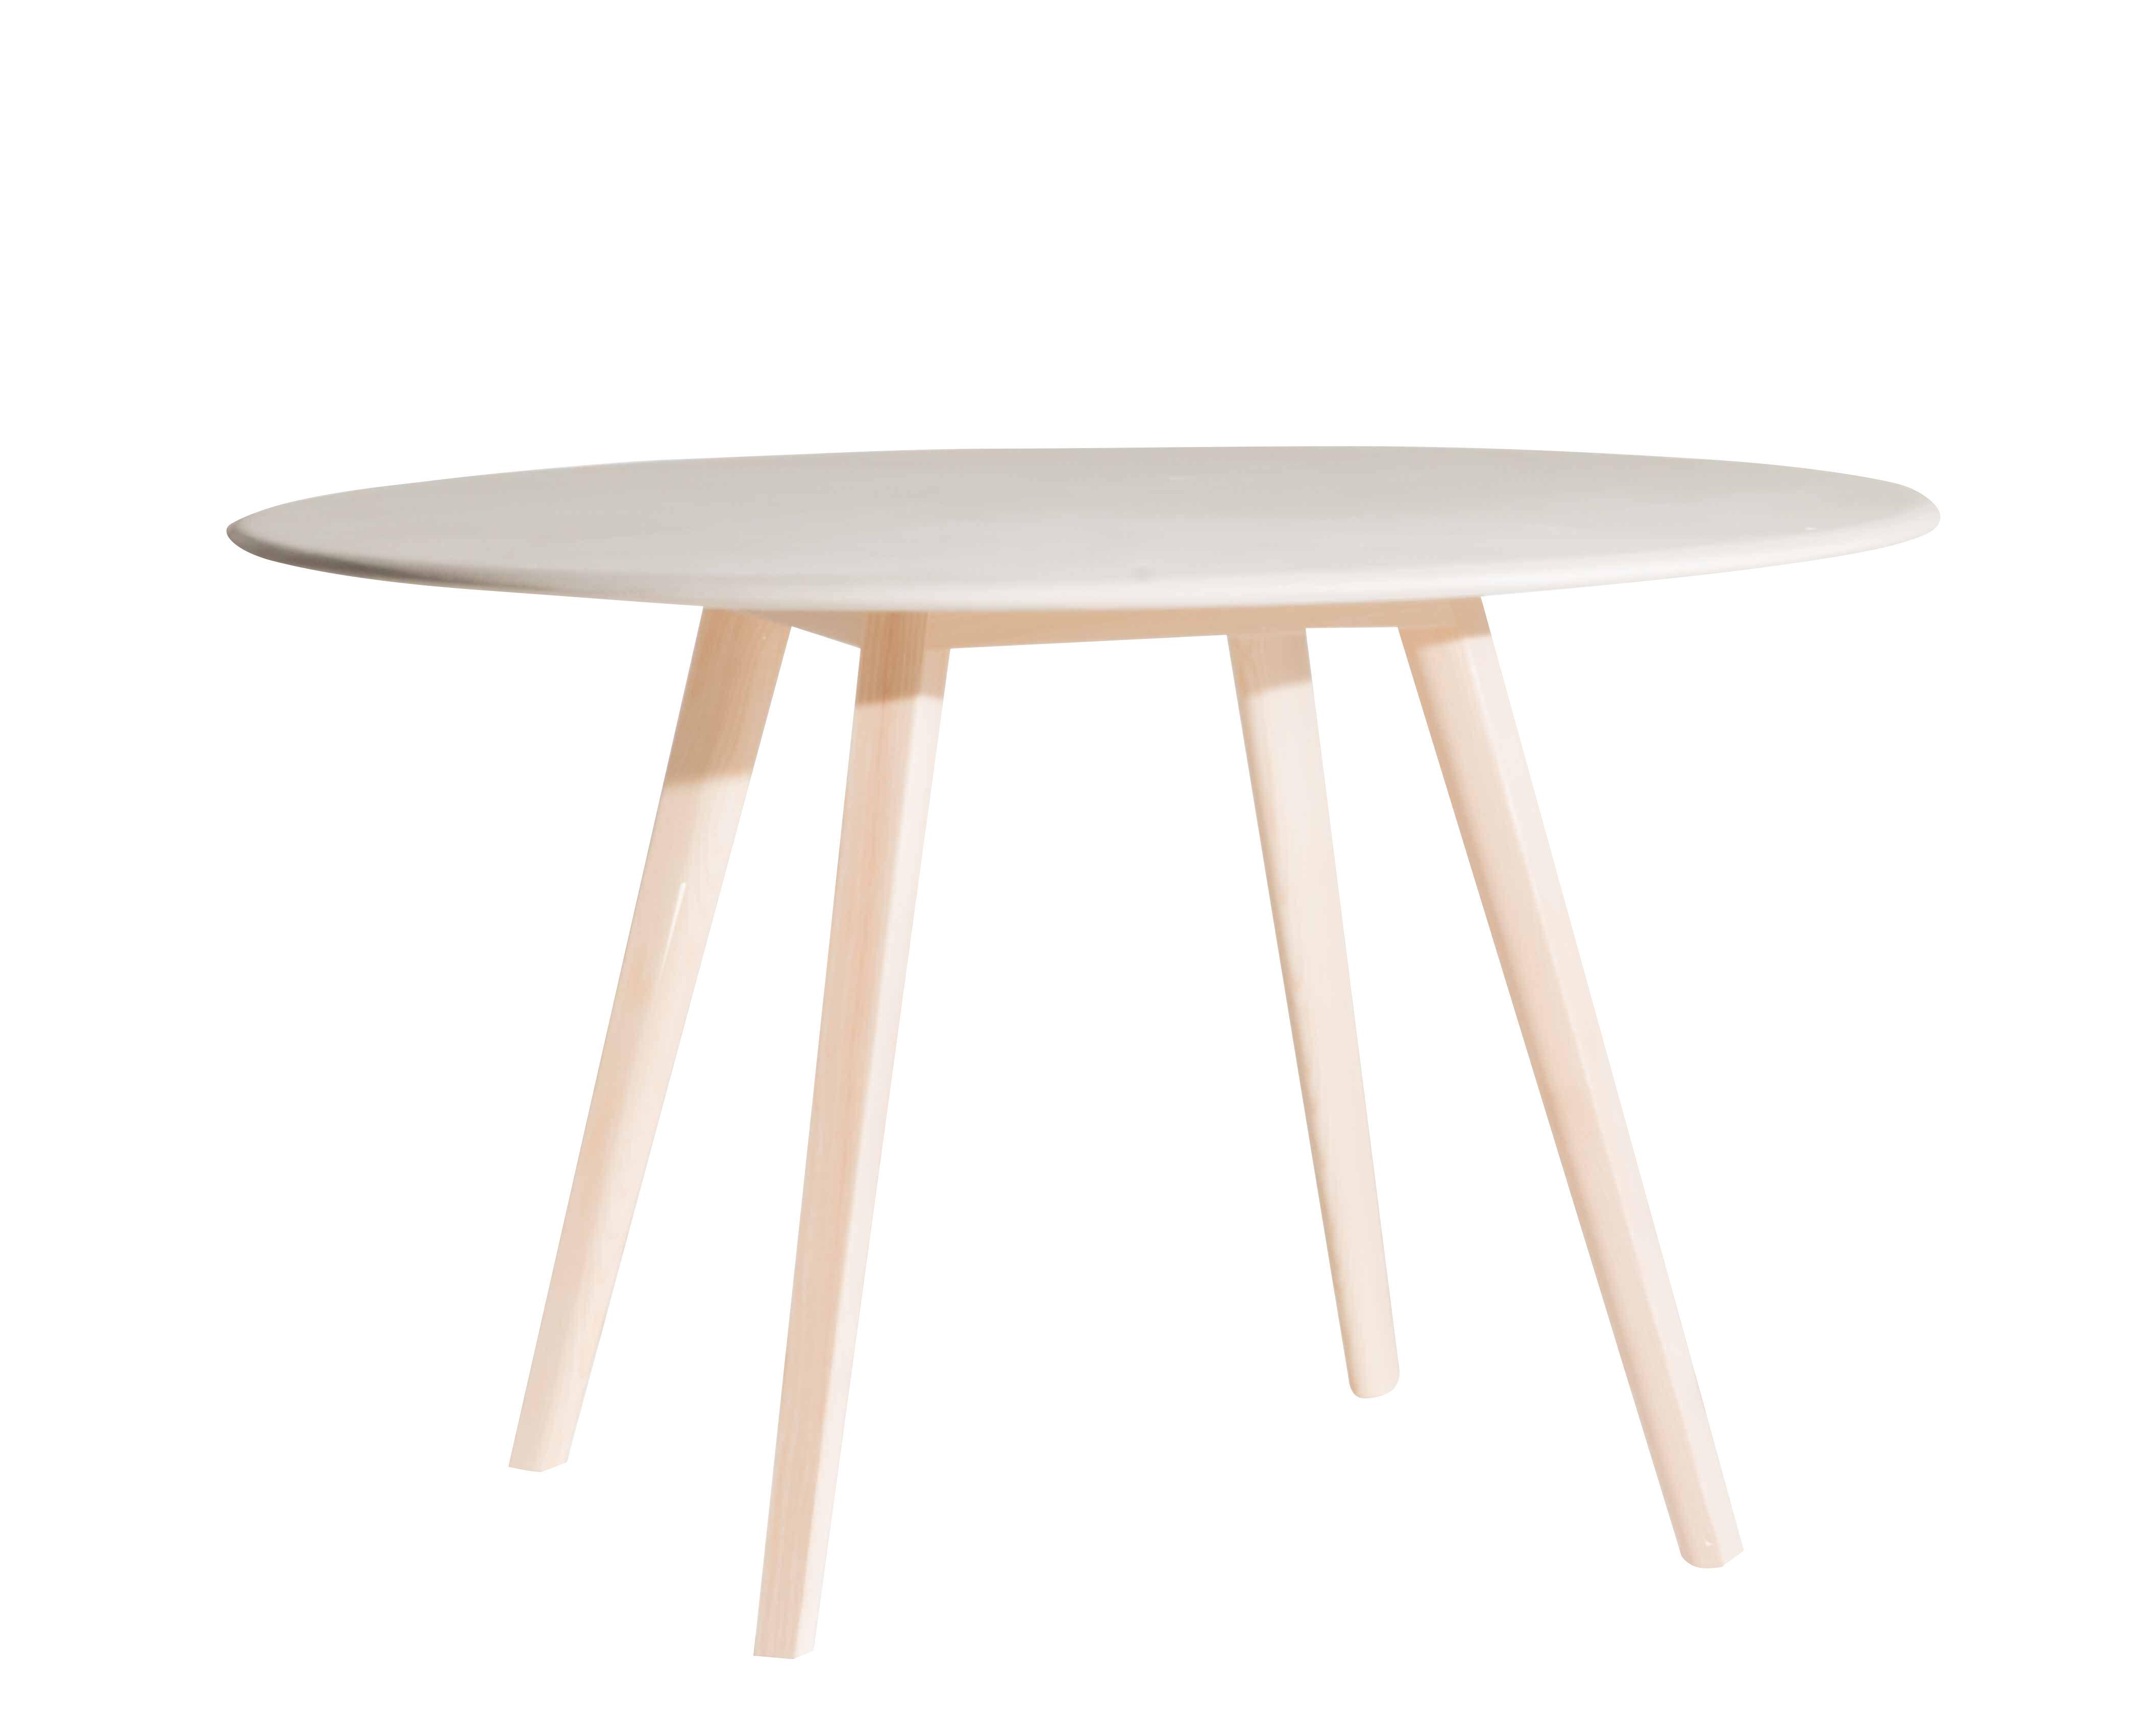 Möbel - Tische - Meridiana Runder Tisch / Ø 100 cm - Driade - Beige / Esche naturbelassen - Esche, massiv, Panneau de particules revêtement argile